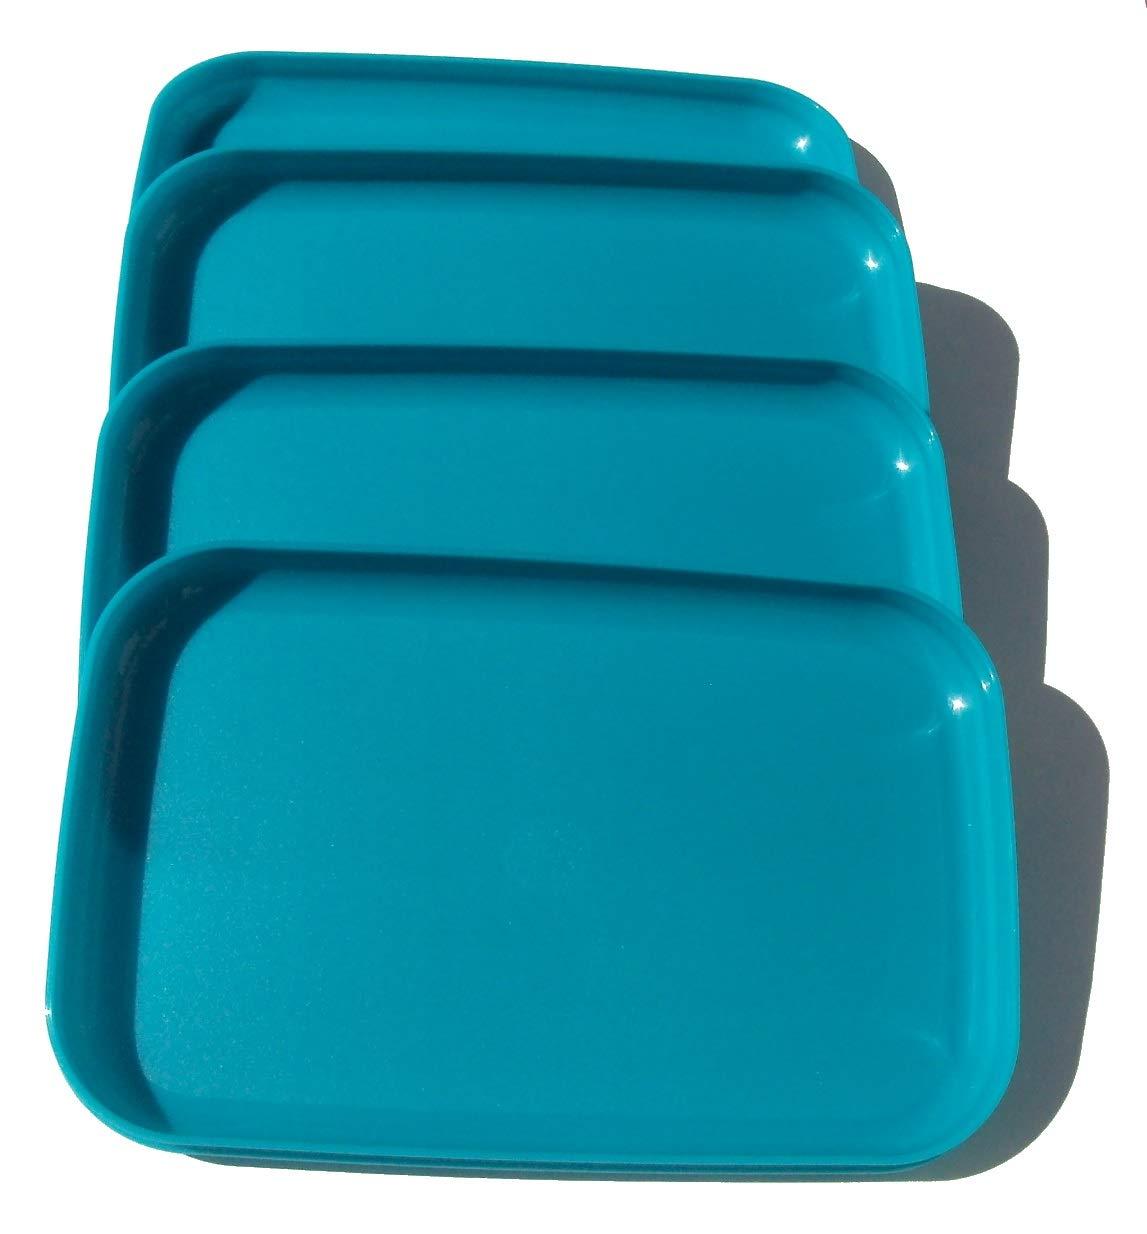 Tupperware Rectangular Luncheon Plates Peacock Blue Set of 4